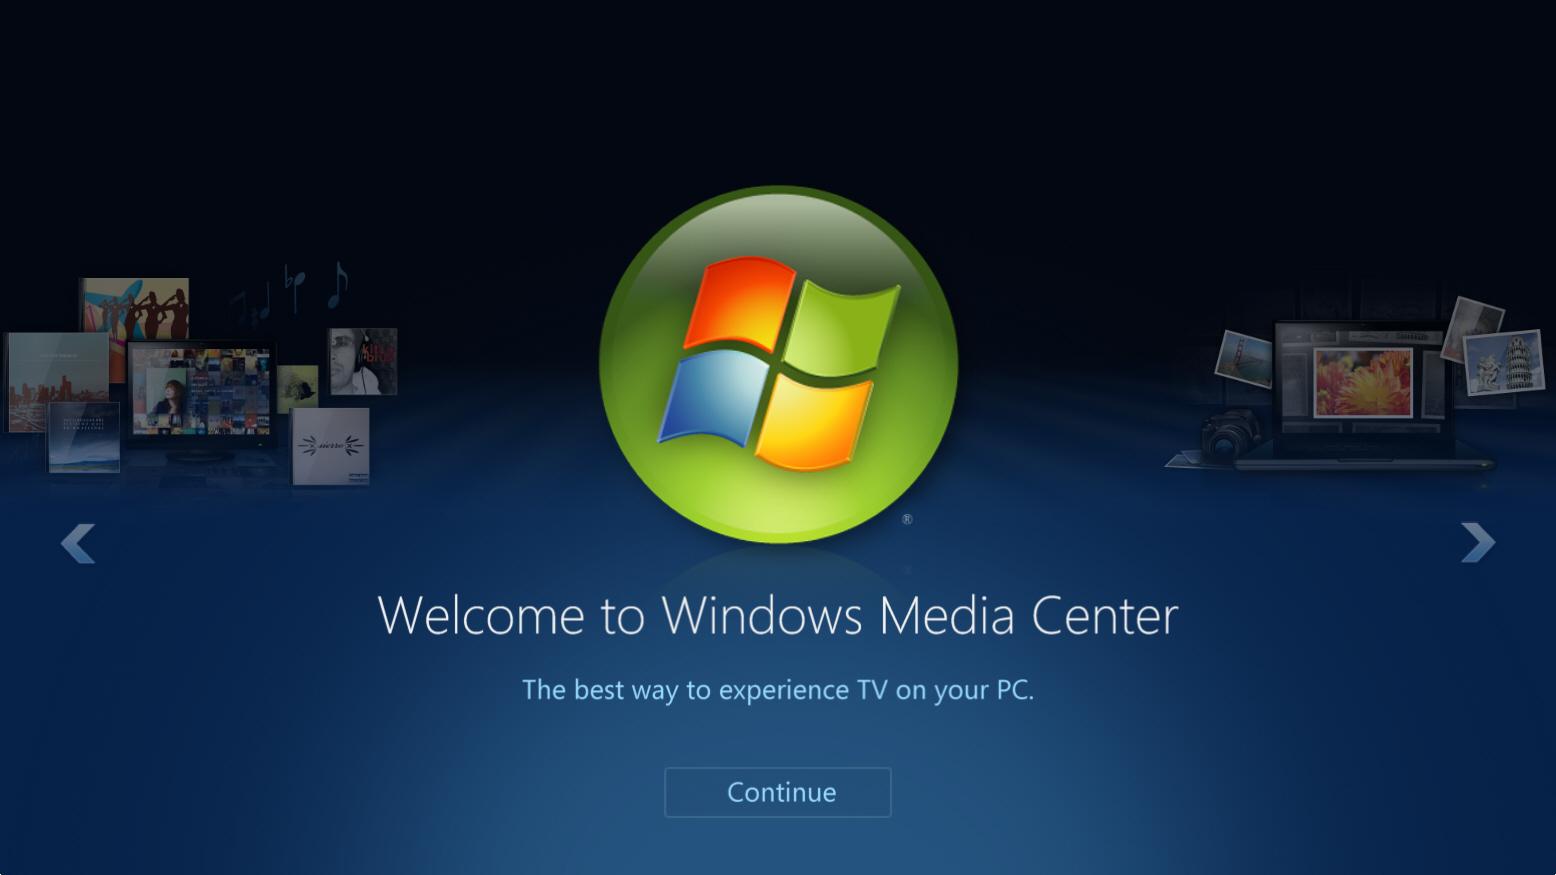 How to install Windows Media Center on Windows 10 Anniversary Update